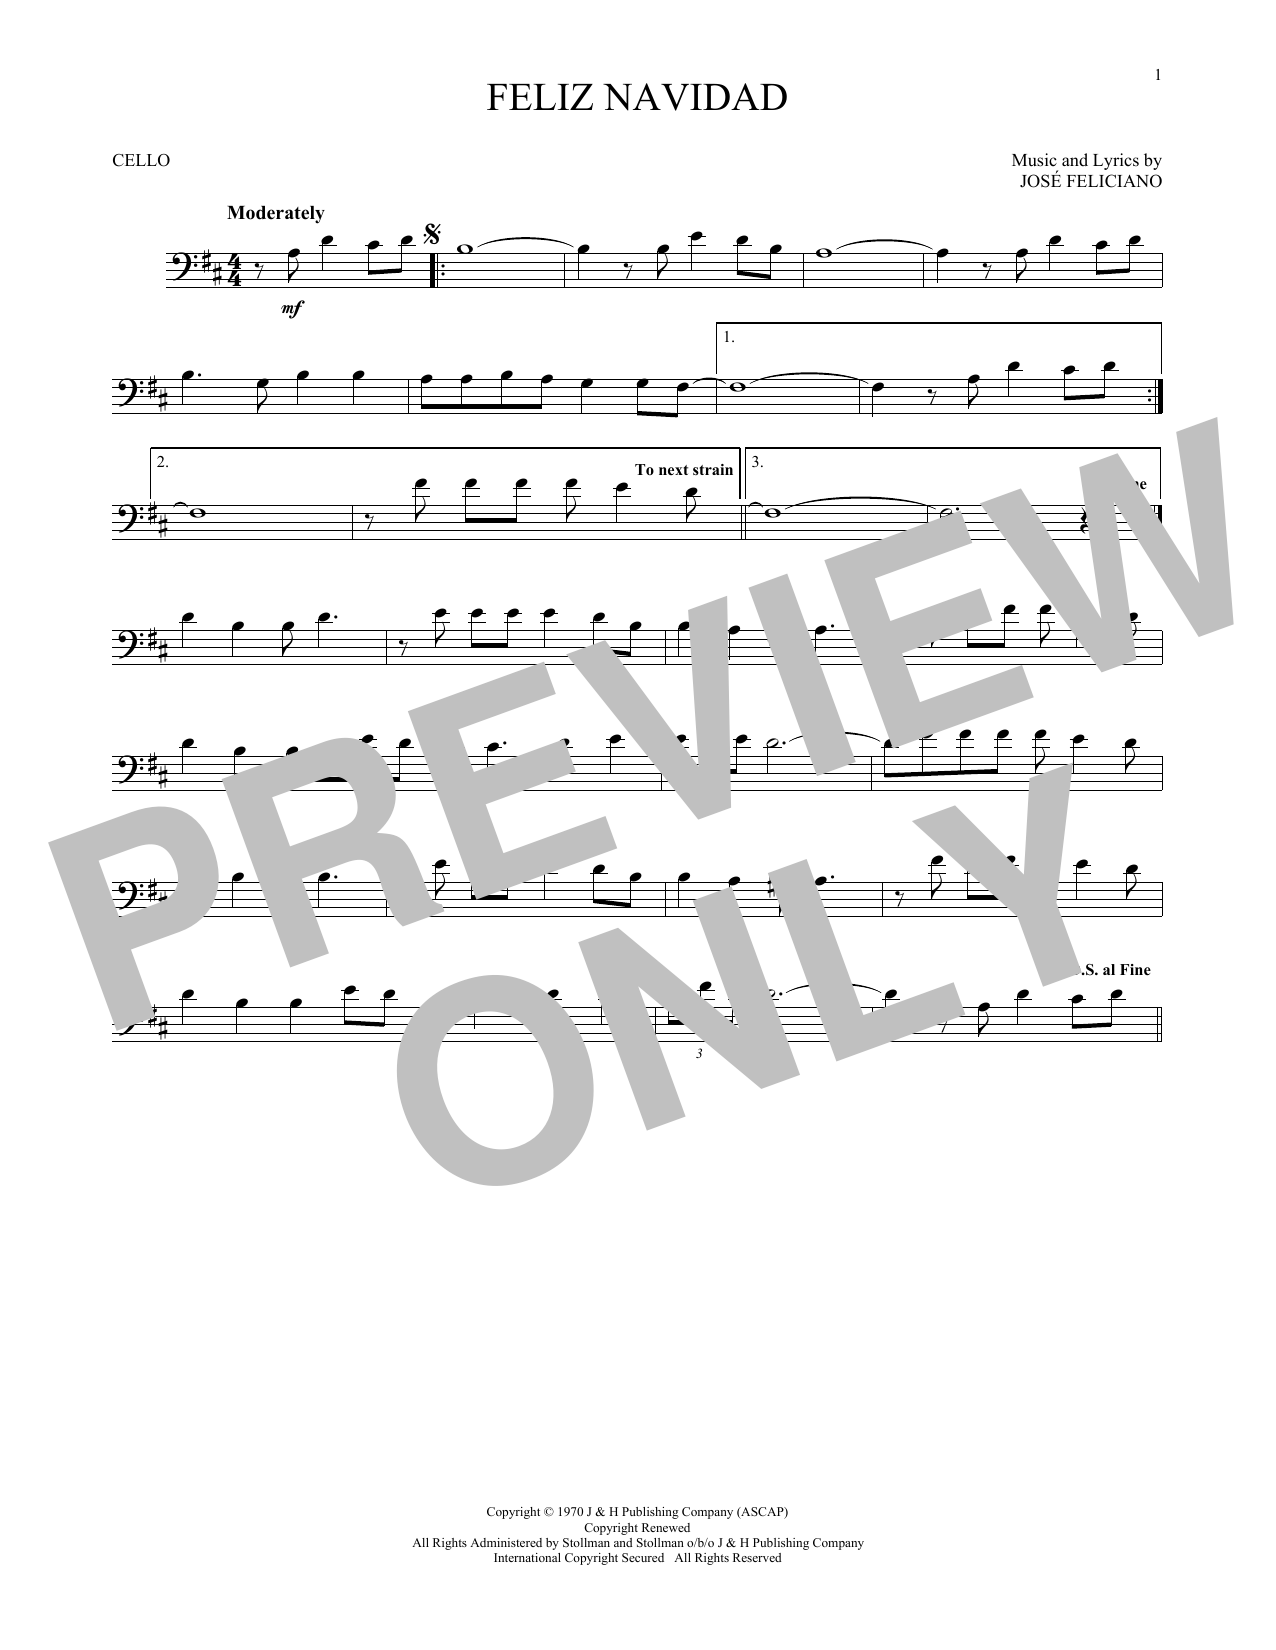 Jose Feliciano Feliz Navidad Sheet Music Notes Chords Printable